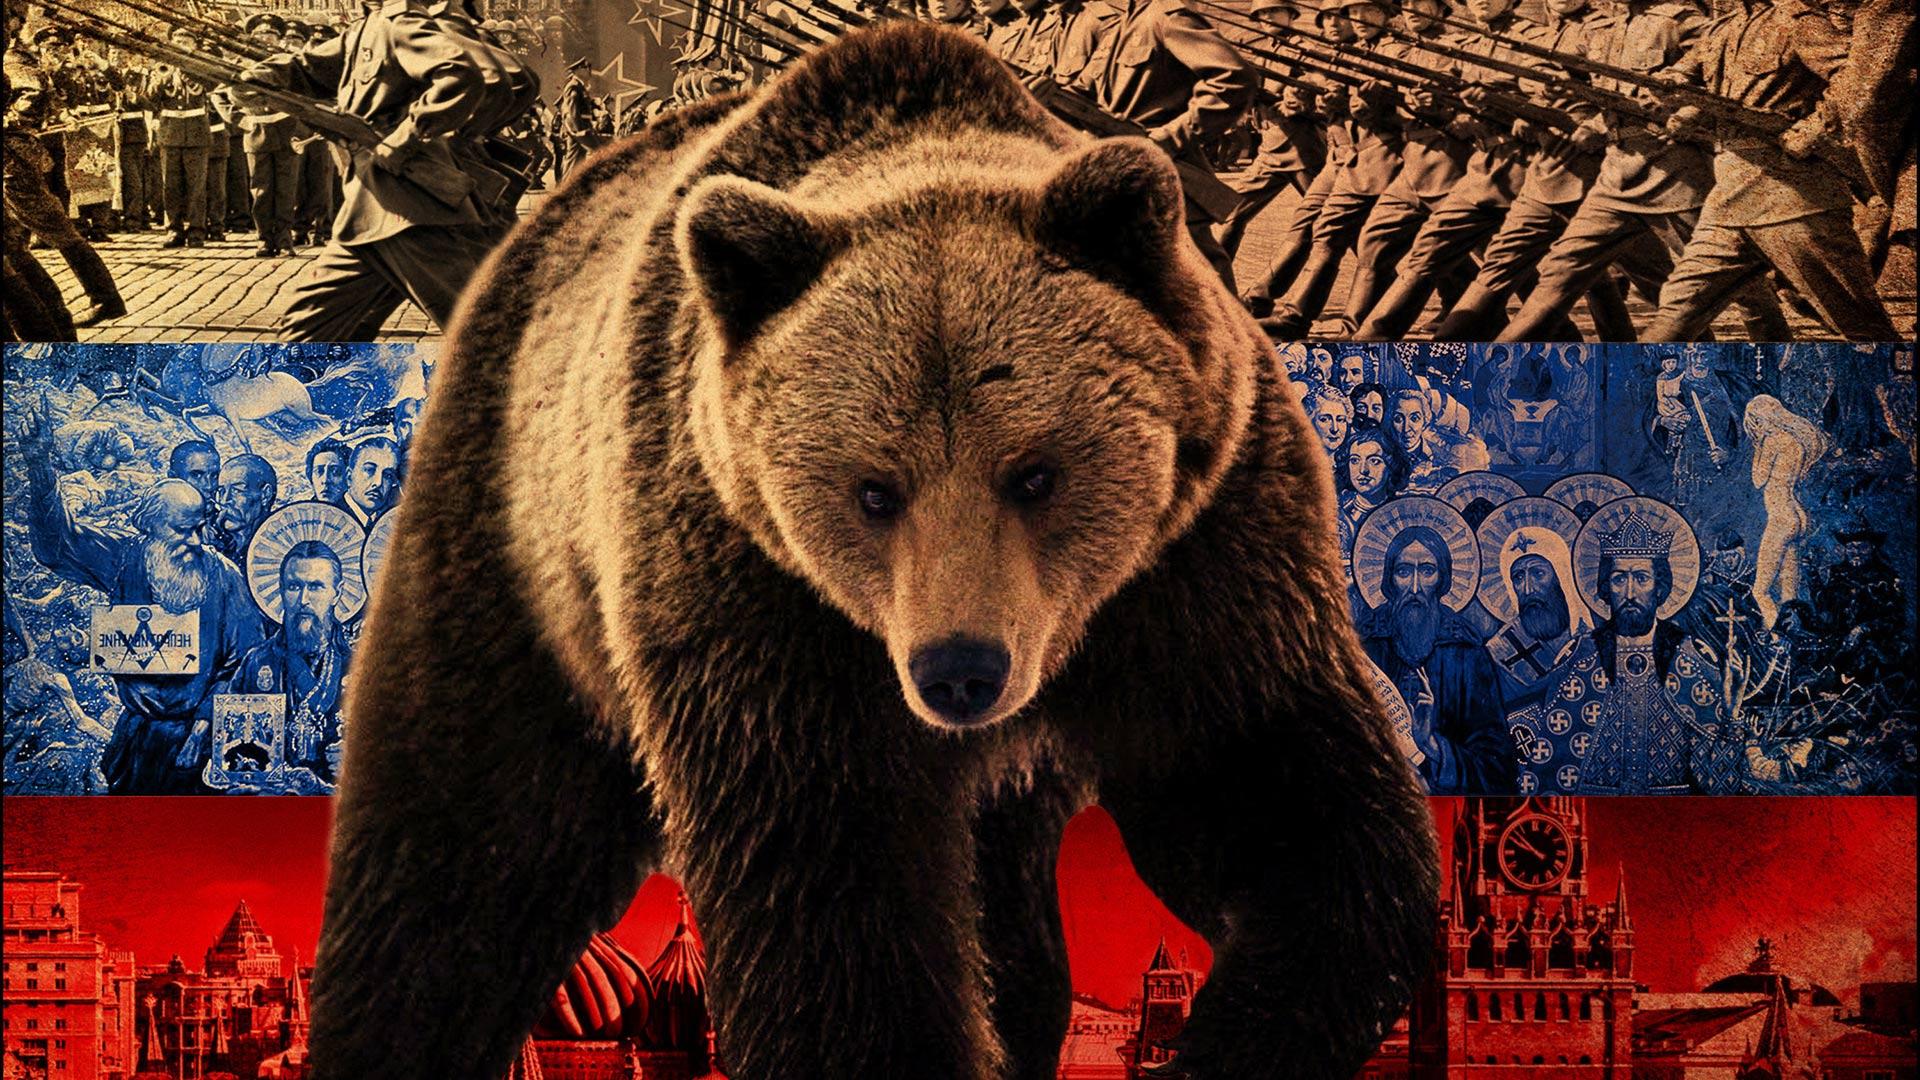 фото русского медведя на аву курорт отлично